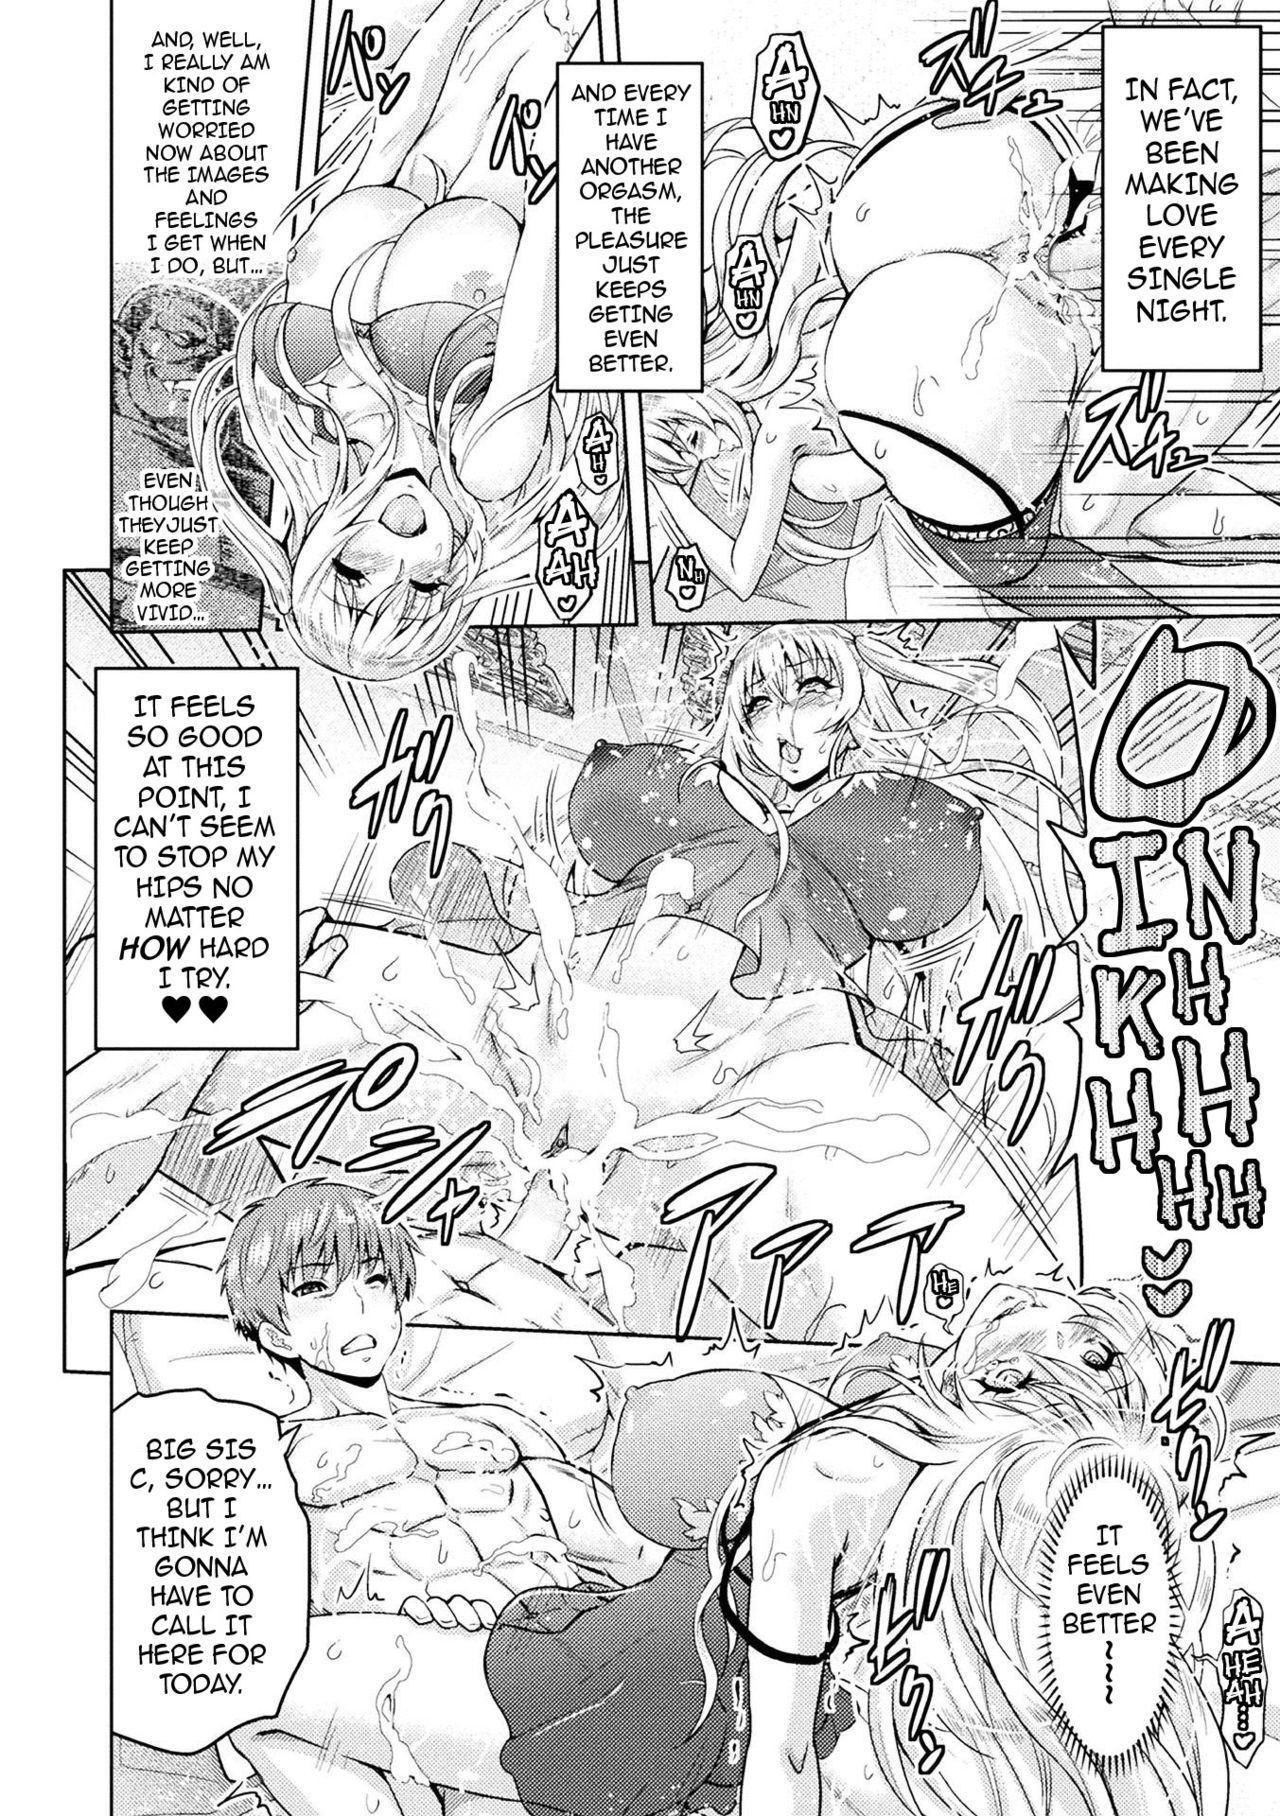 [Yamada Gogogo] Erona ~Orc no Inmon ni Okasareta Onna Kishi no Matsuro~ | Erona ~The Fall of a Beautiful Knight Cursed with the Lewd Mark of an Orc~ Ch. 1-6 [English] [darknight] [Decensored] [ongoing] 143